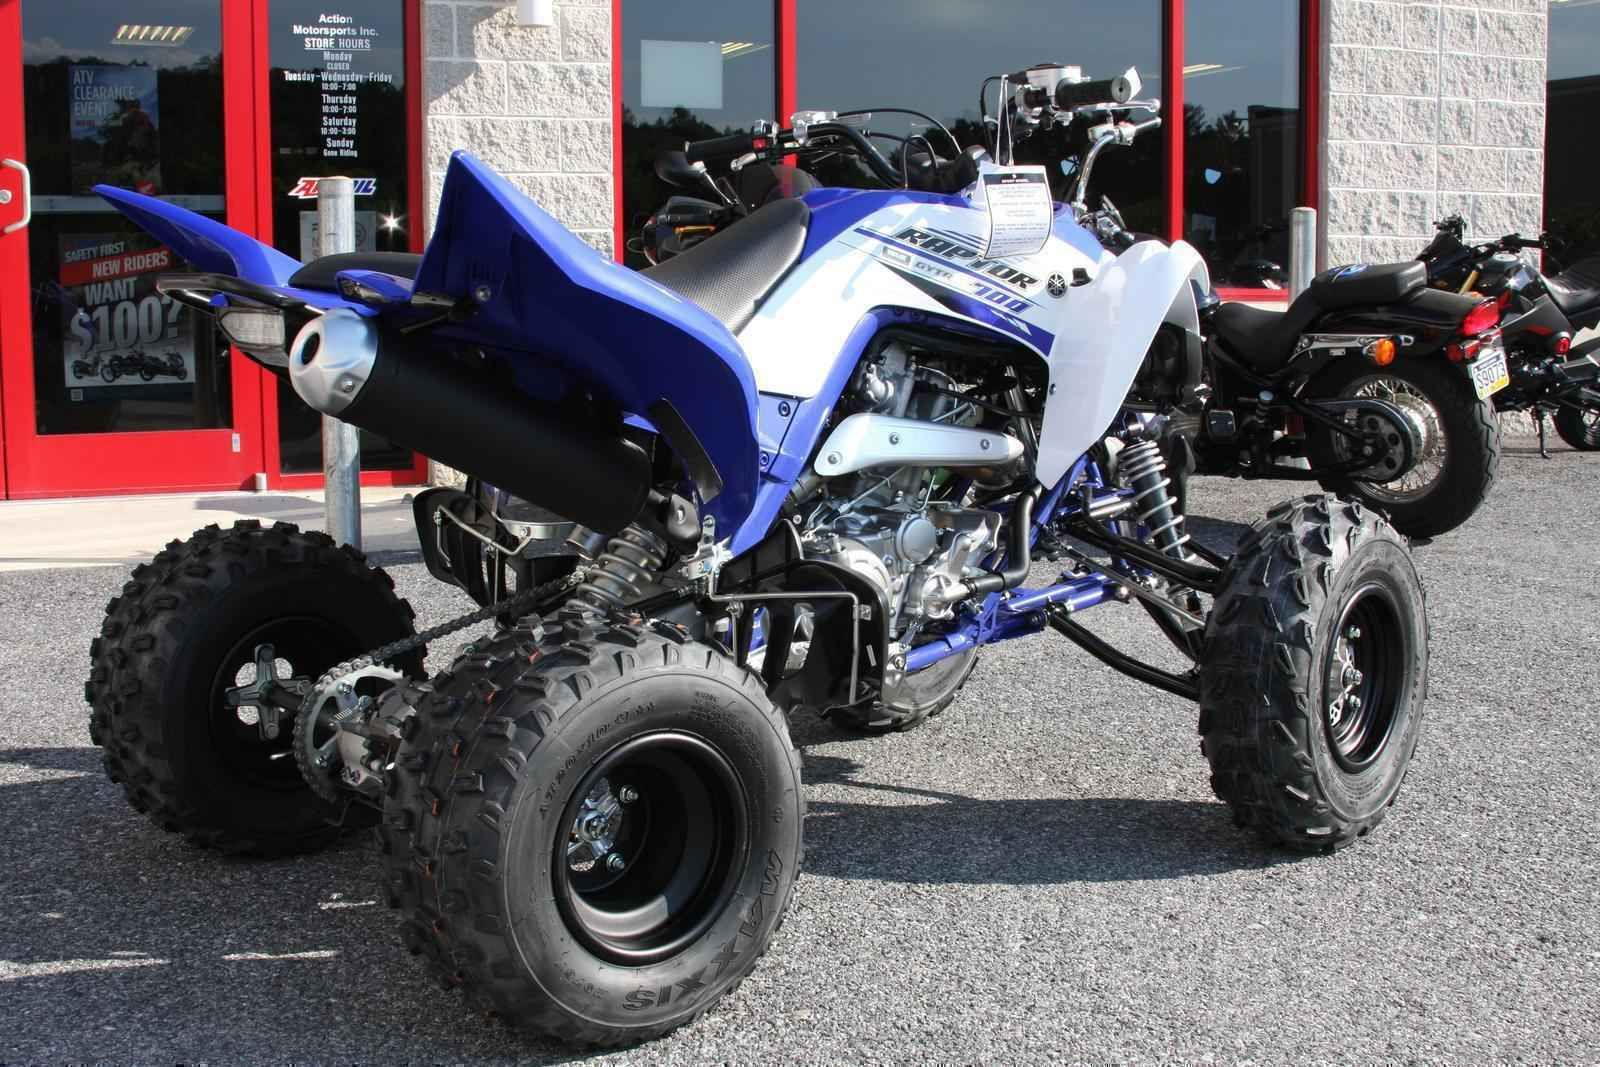 New 2016 Yamaha RAPTOR 700 ATVs For Sale in Pennsylvania